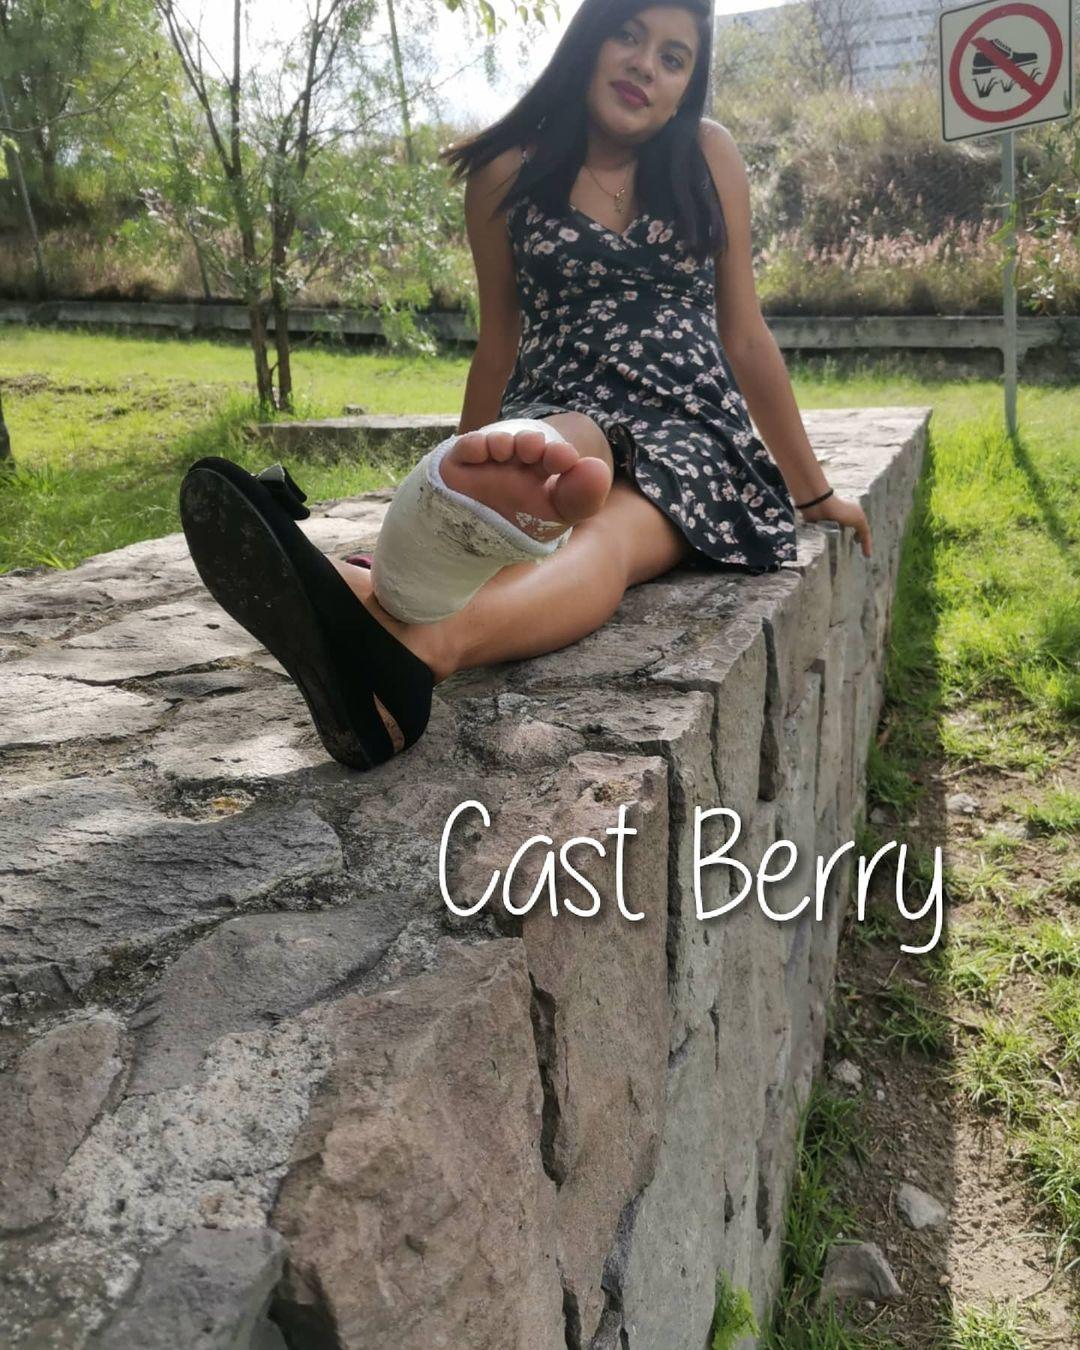 Cast Berry